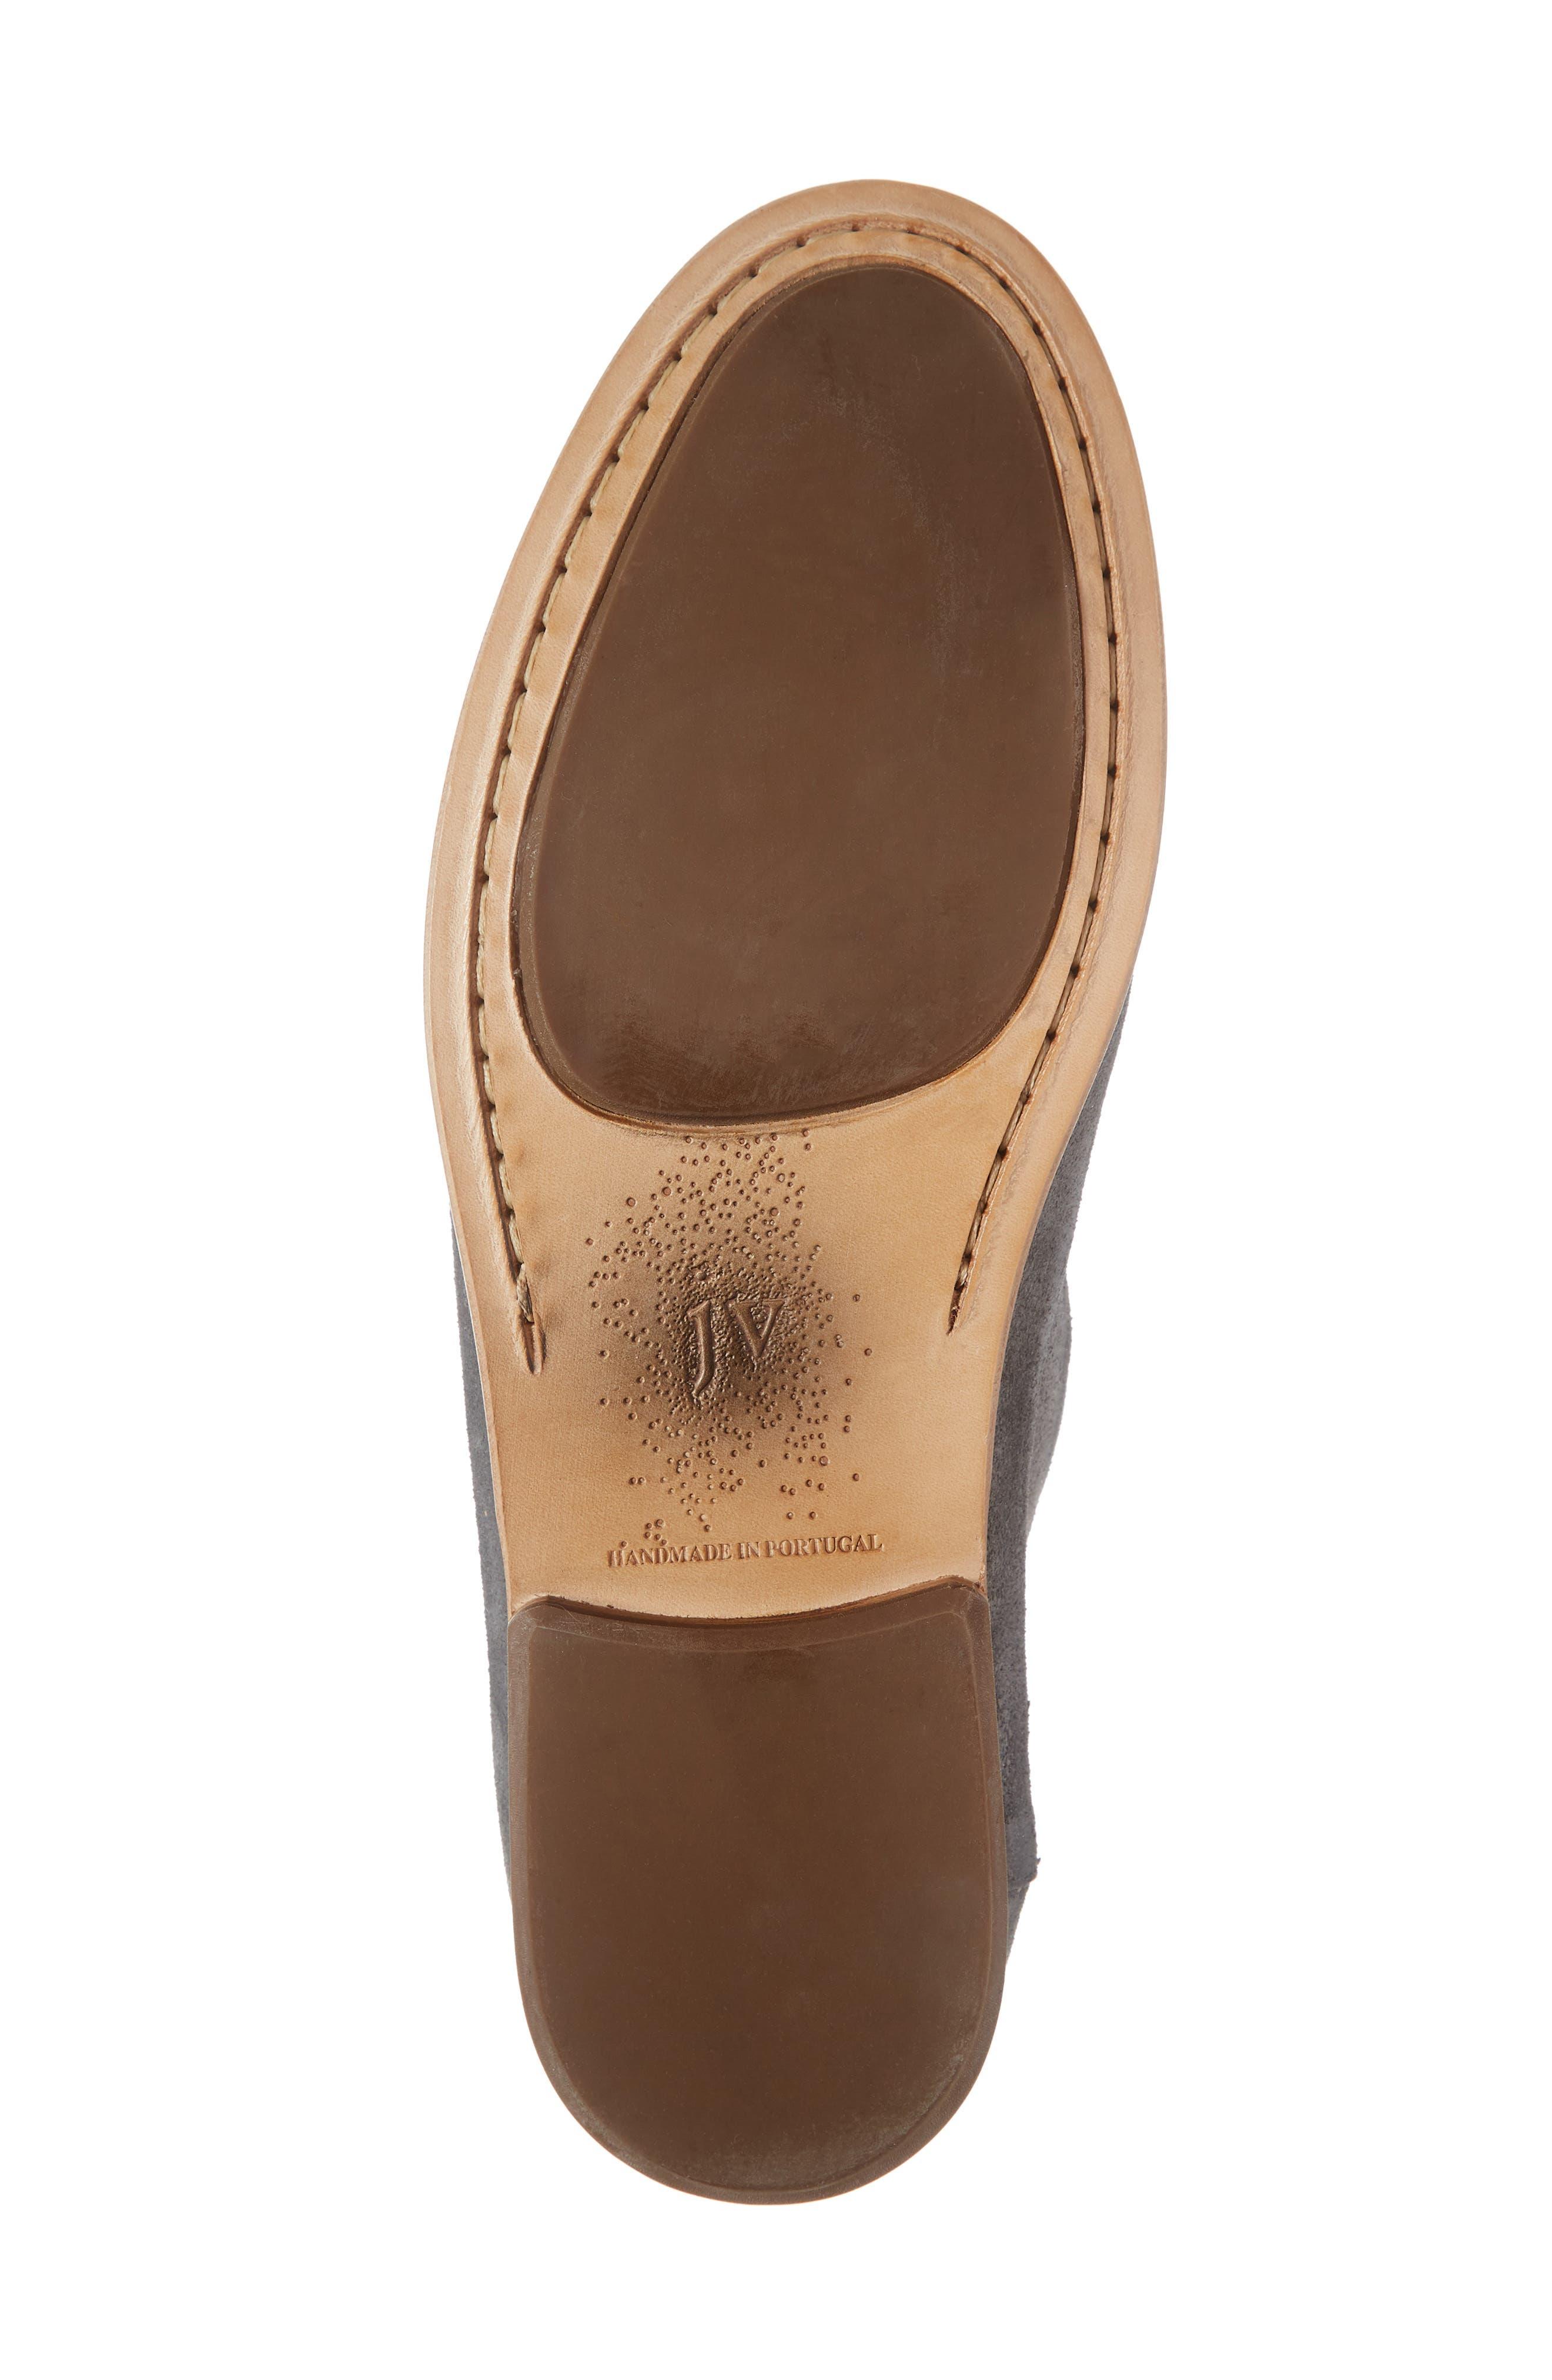 John Varvatos Loafers Collection Amalfi Venetian Loafer